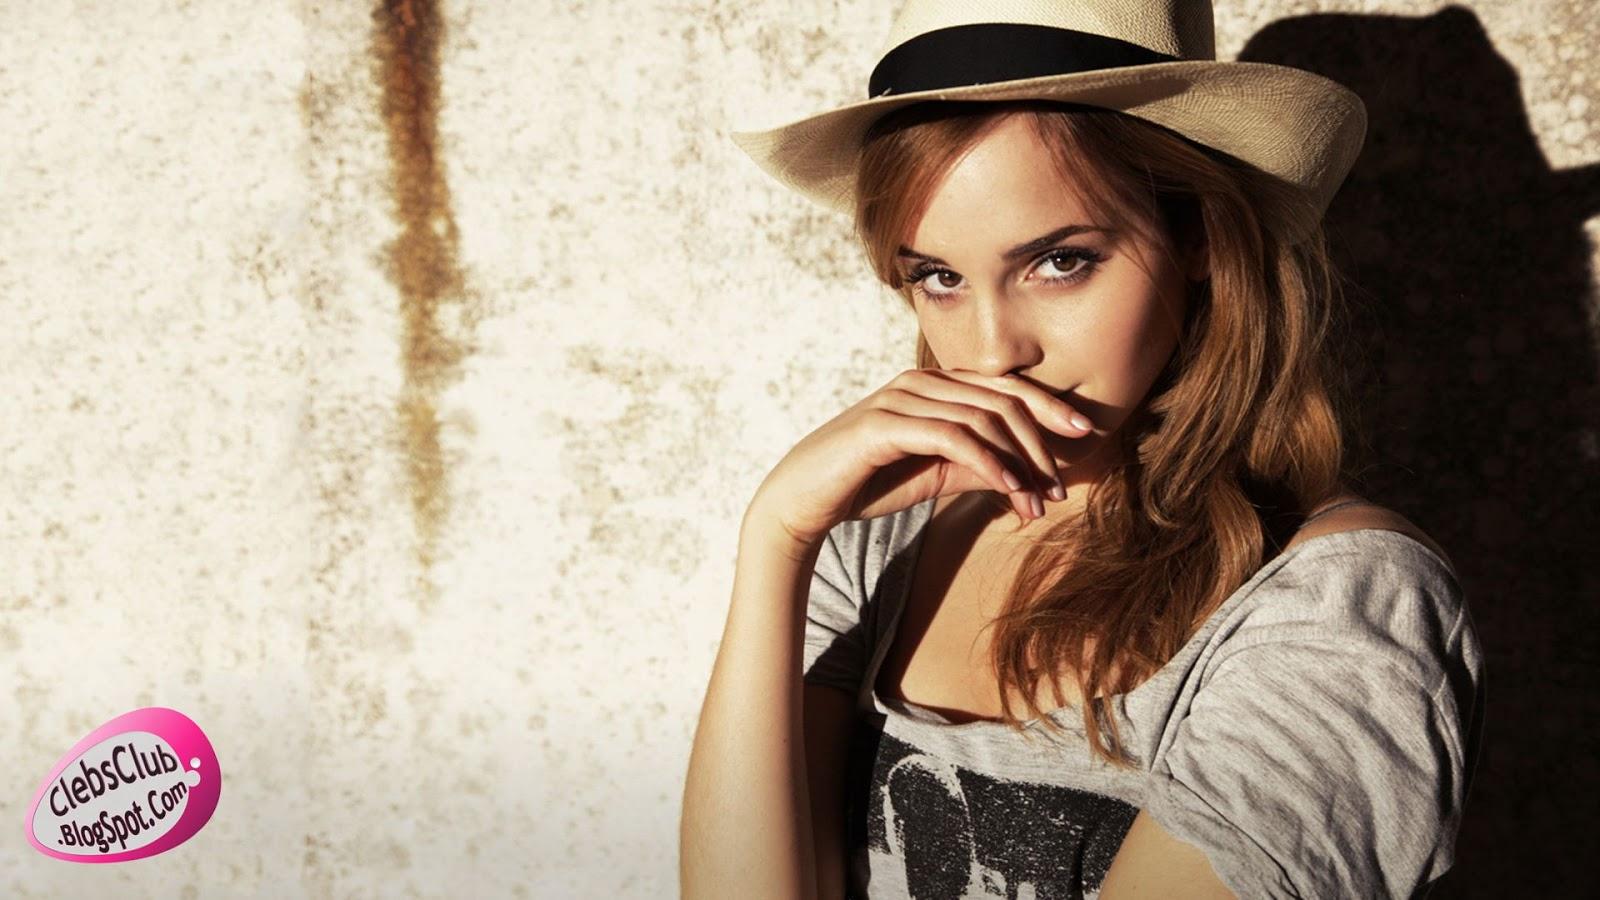 Female celebrity wallpapers hd Celebrity Club 1600x900